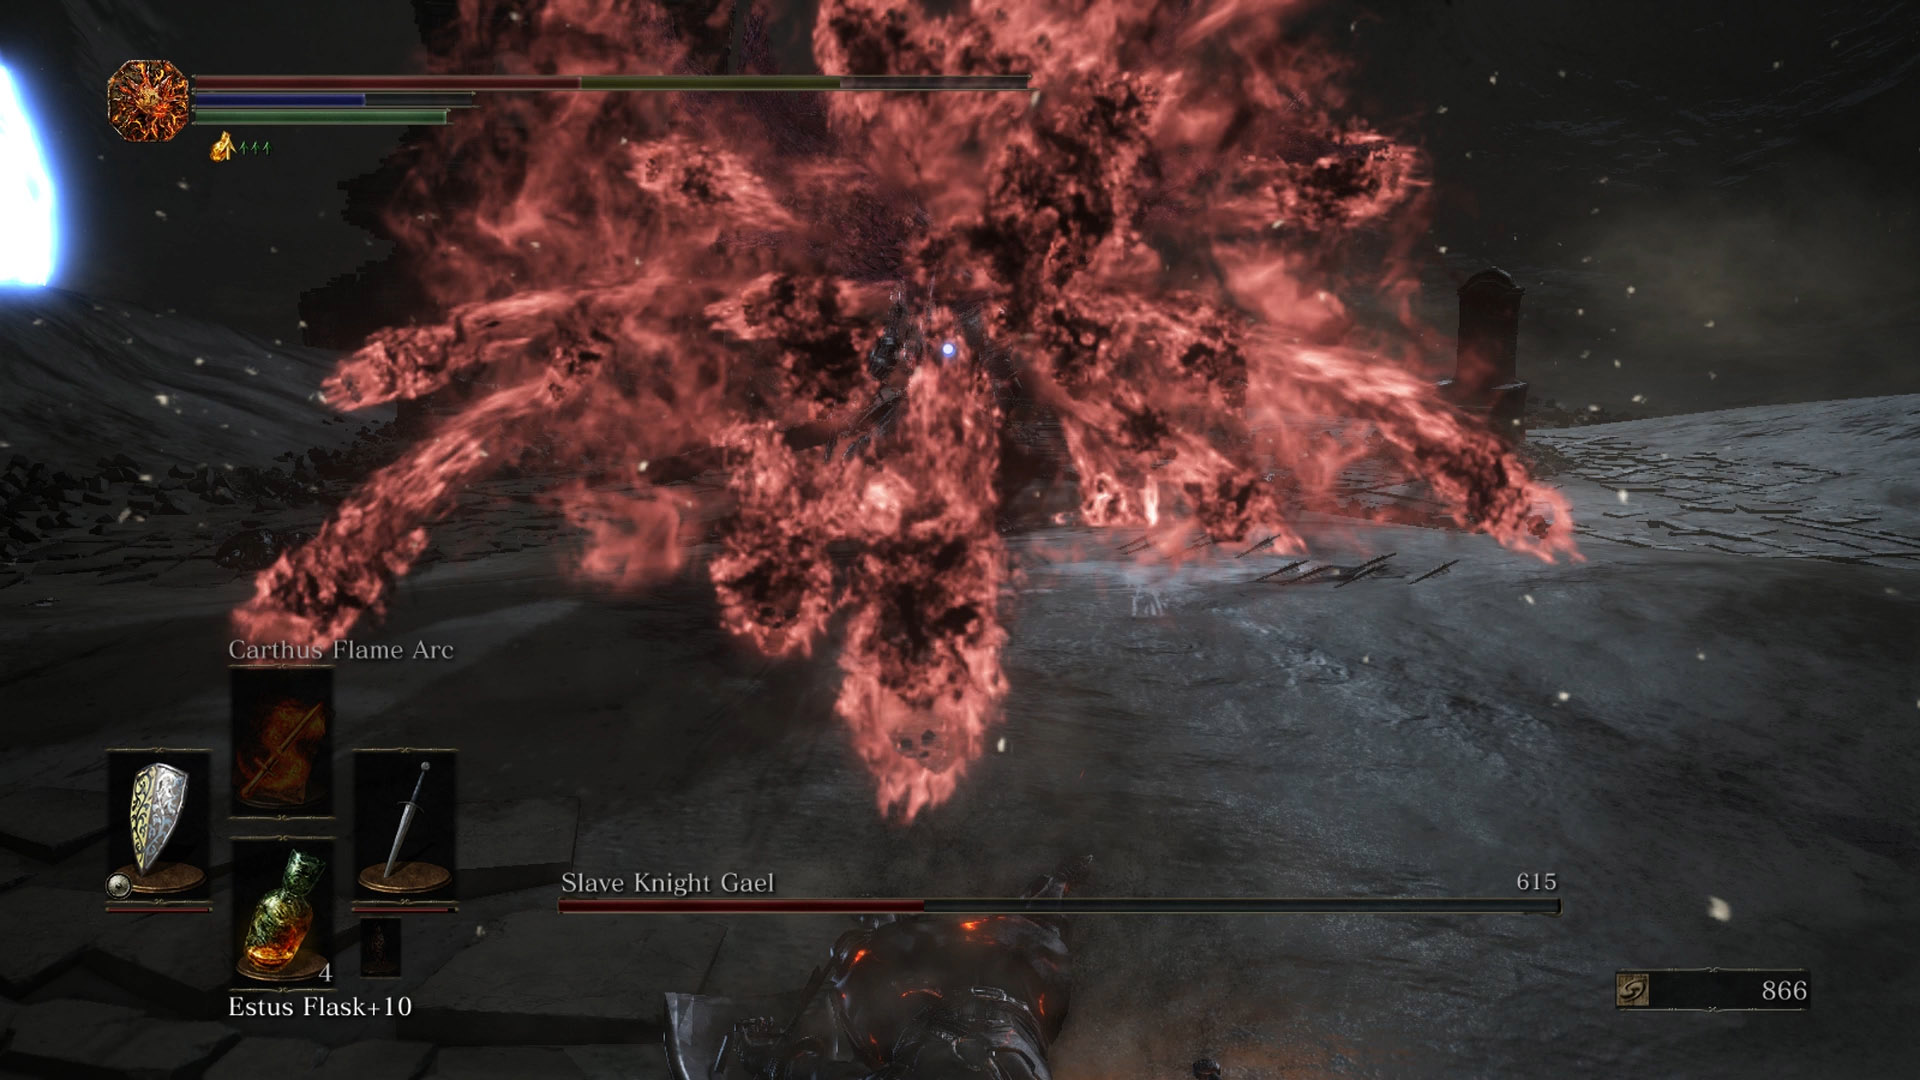 Dark Souls 3 How To Kill Slave Knight Gael Allgamers